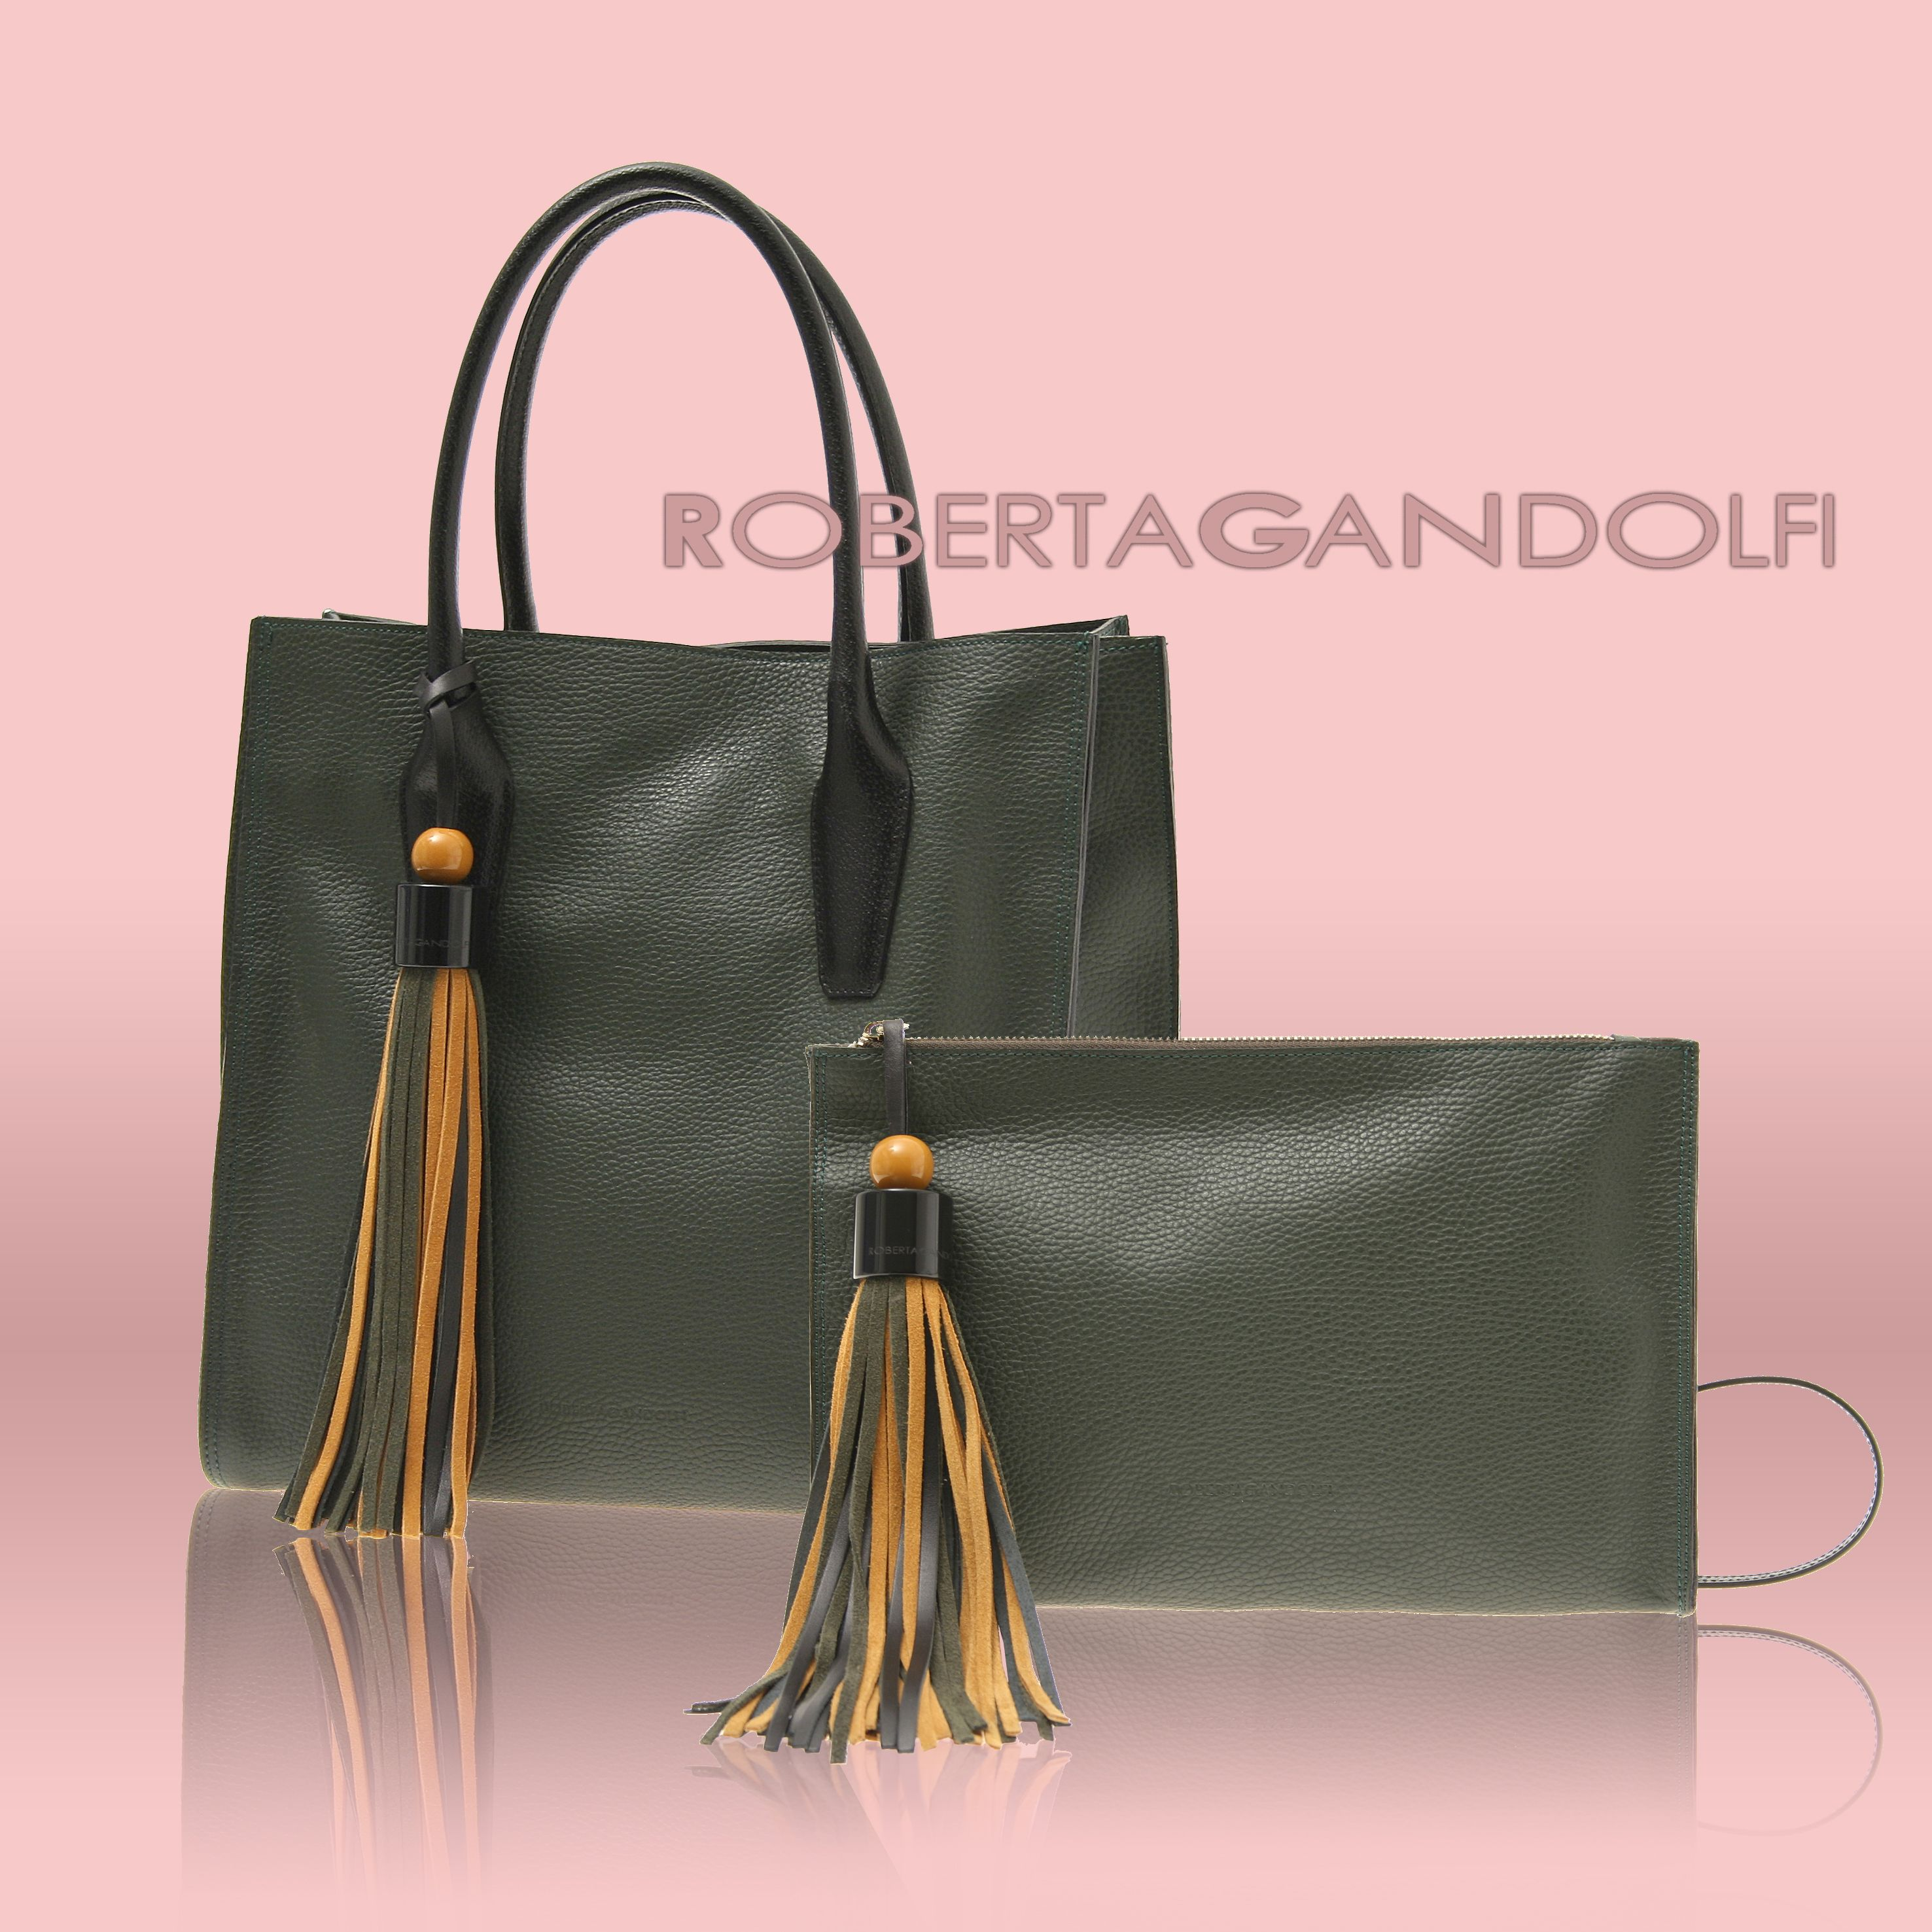 Roberta Gandolfi collection #bags #Italianfashion